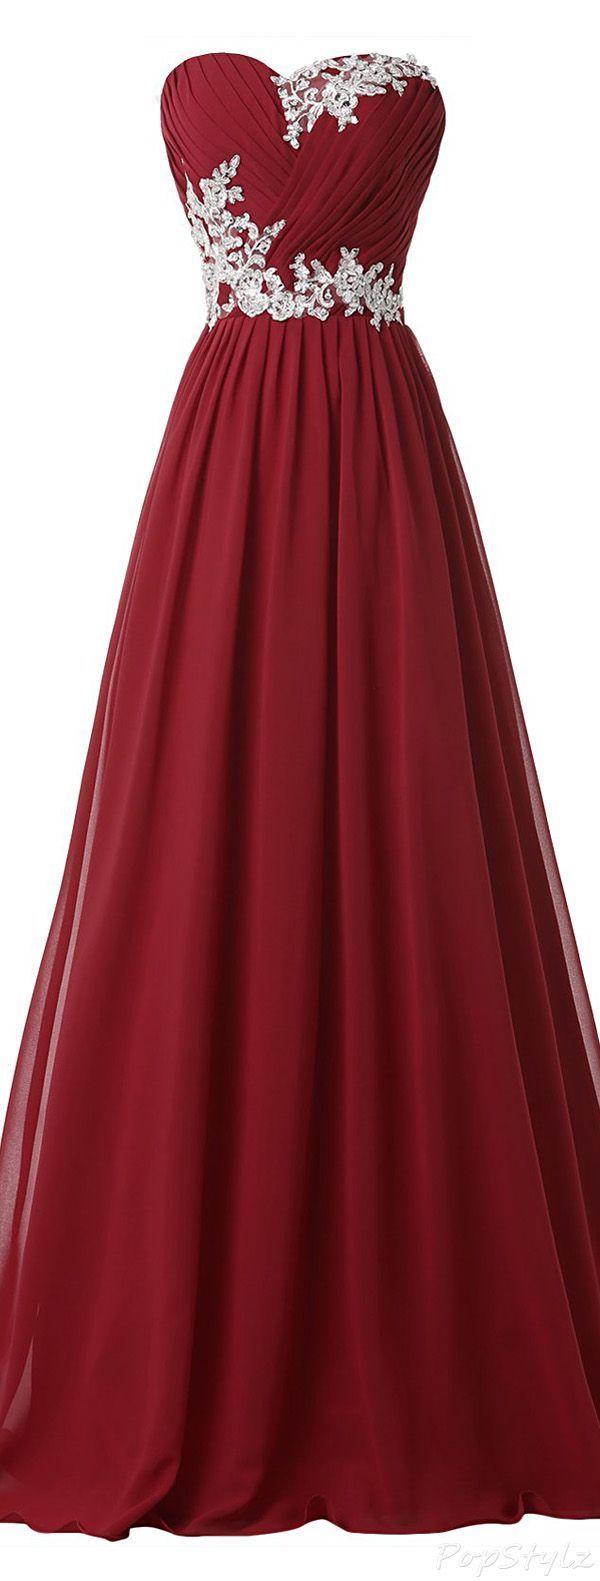 Plus Size Kleid, Cocktailkleid, Burgunderkleid Dunkelrotes Kleid